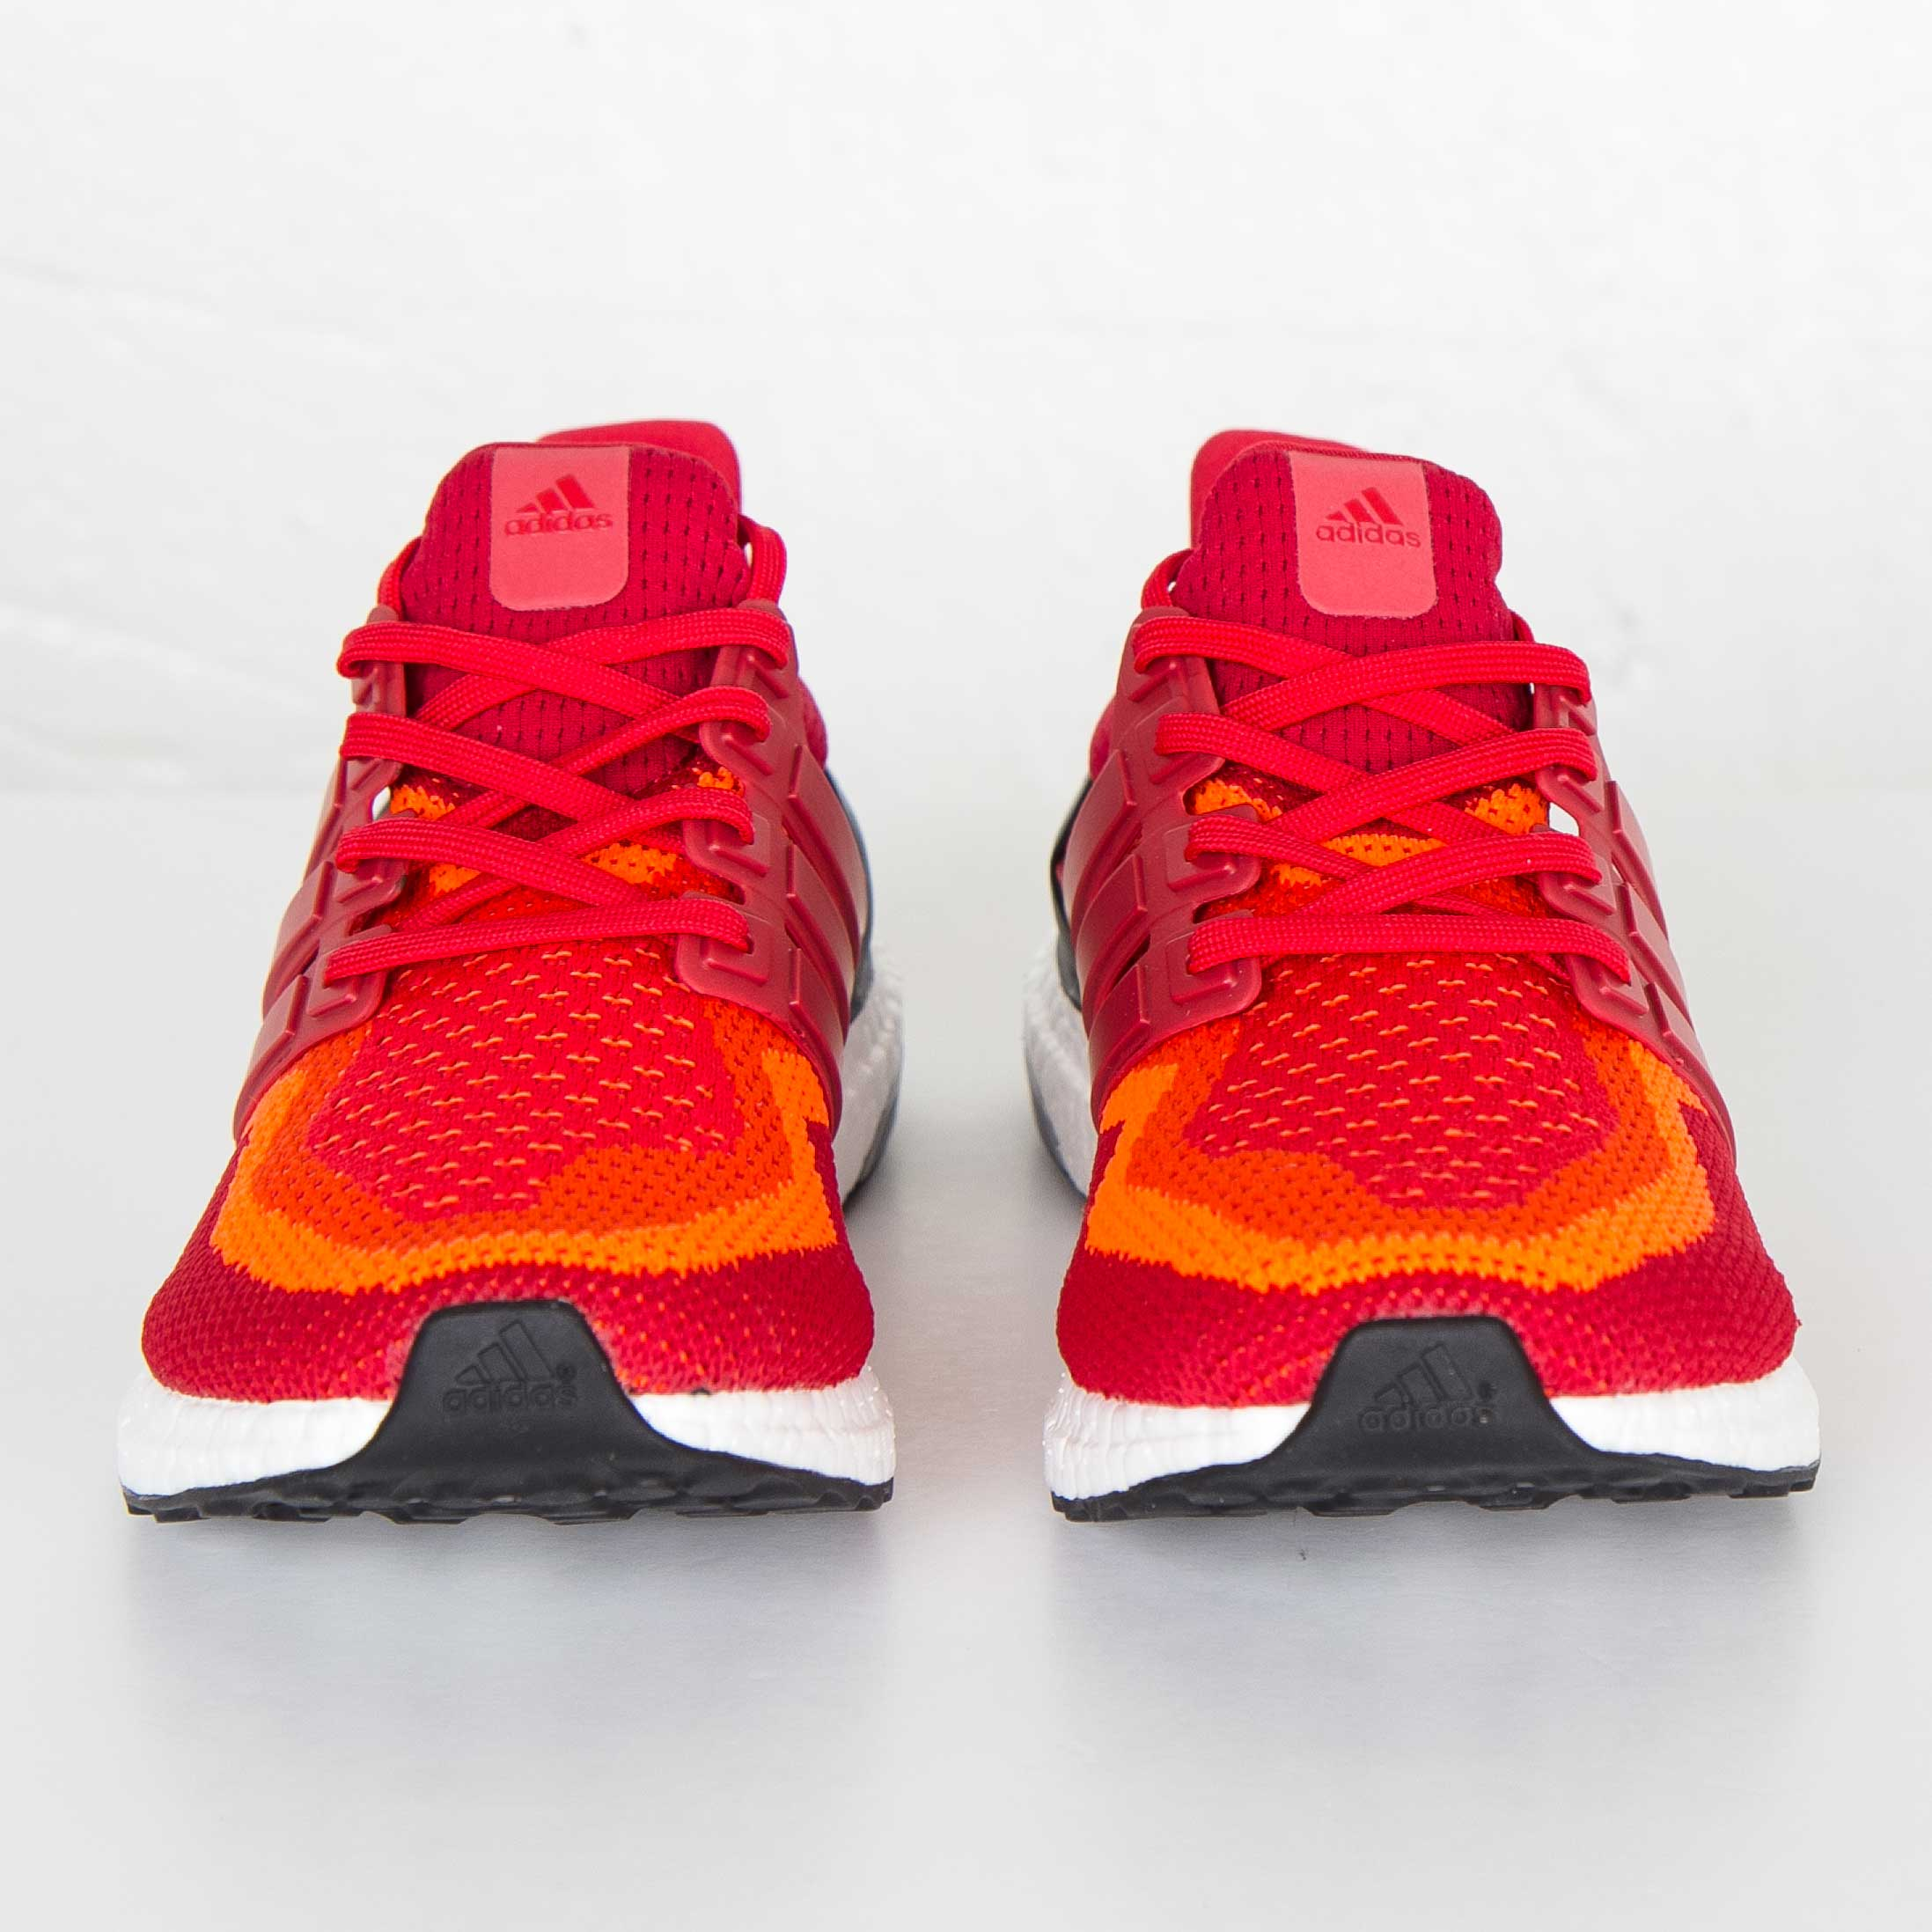 cc22ef4f46e12 ... red yellow ... adidas ultra boost m adidas ultra boost m .